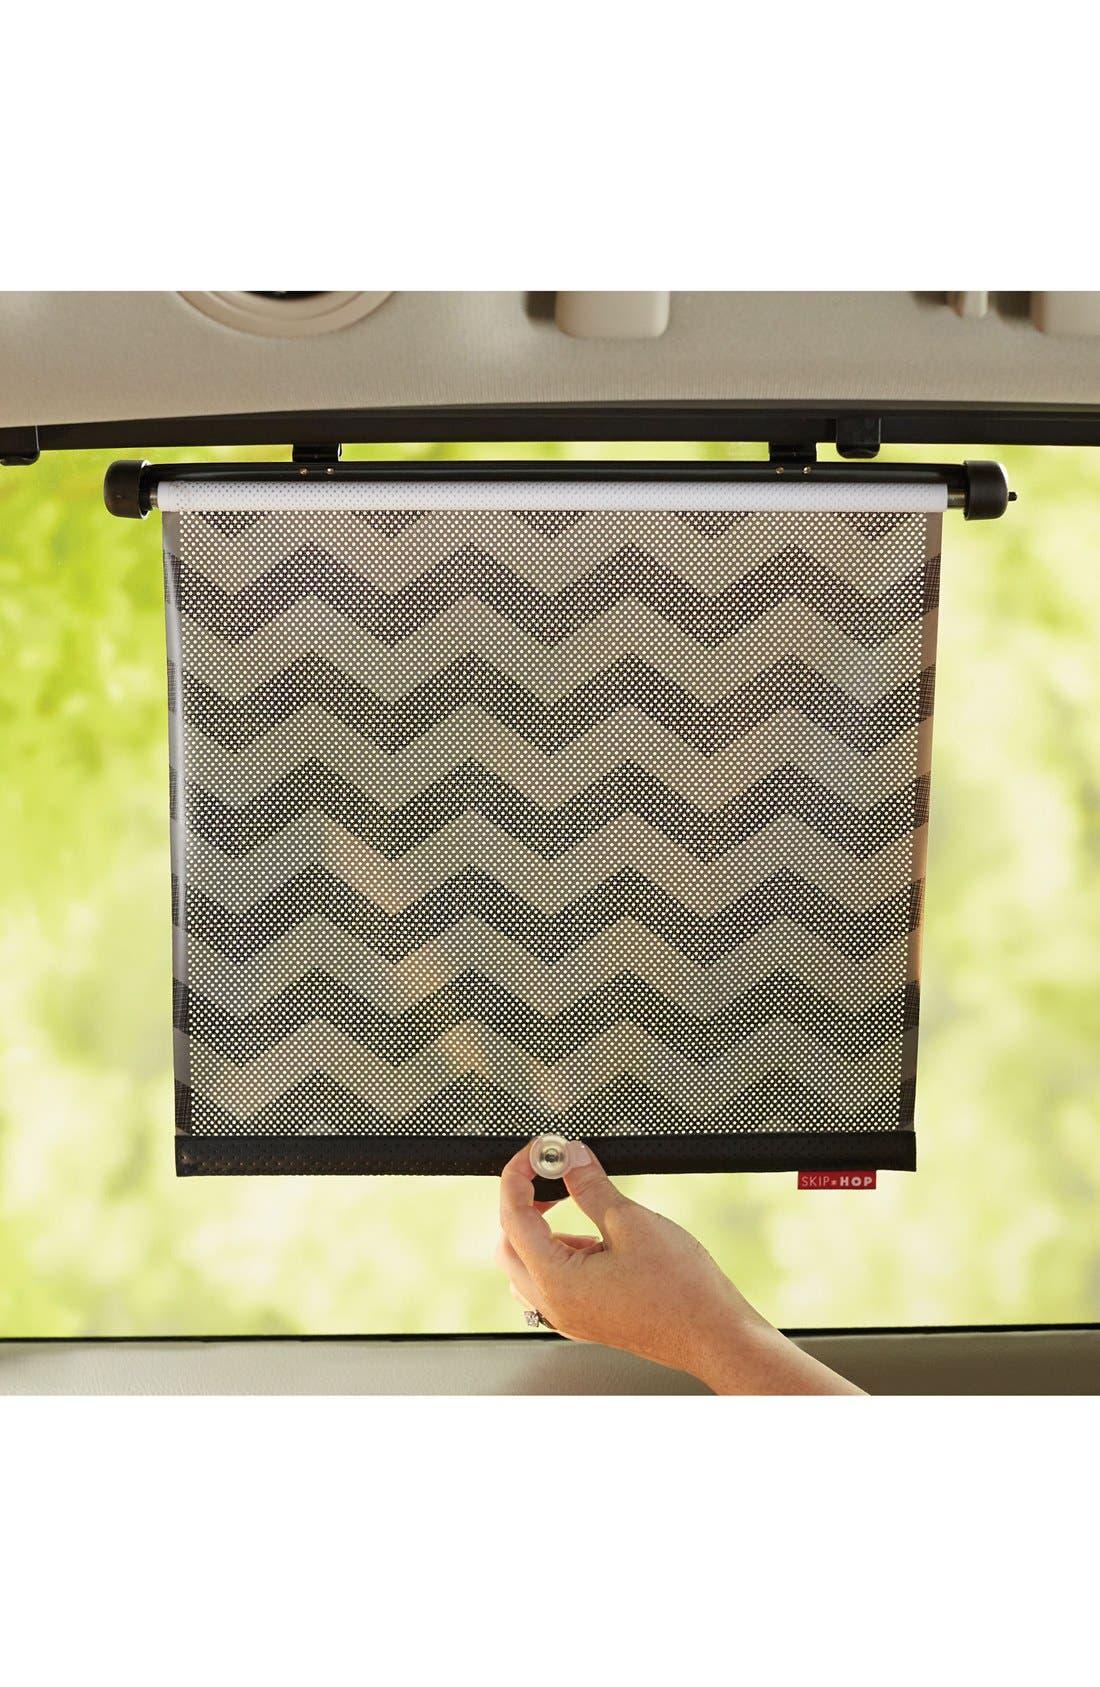 dark window shades pull down car window shades main color dark chevron skip hop shades set of 2 nordstrom